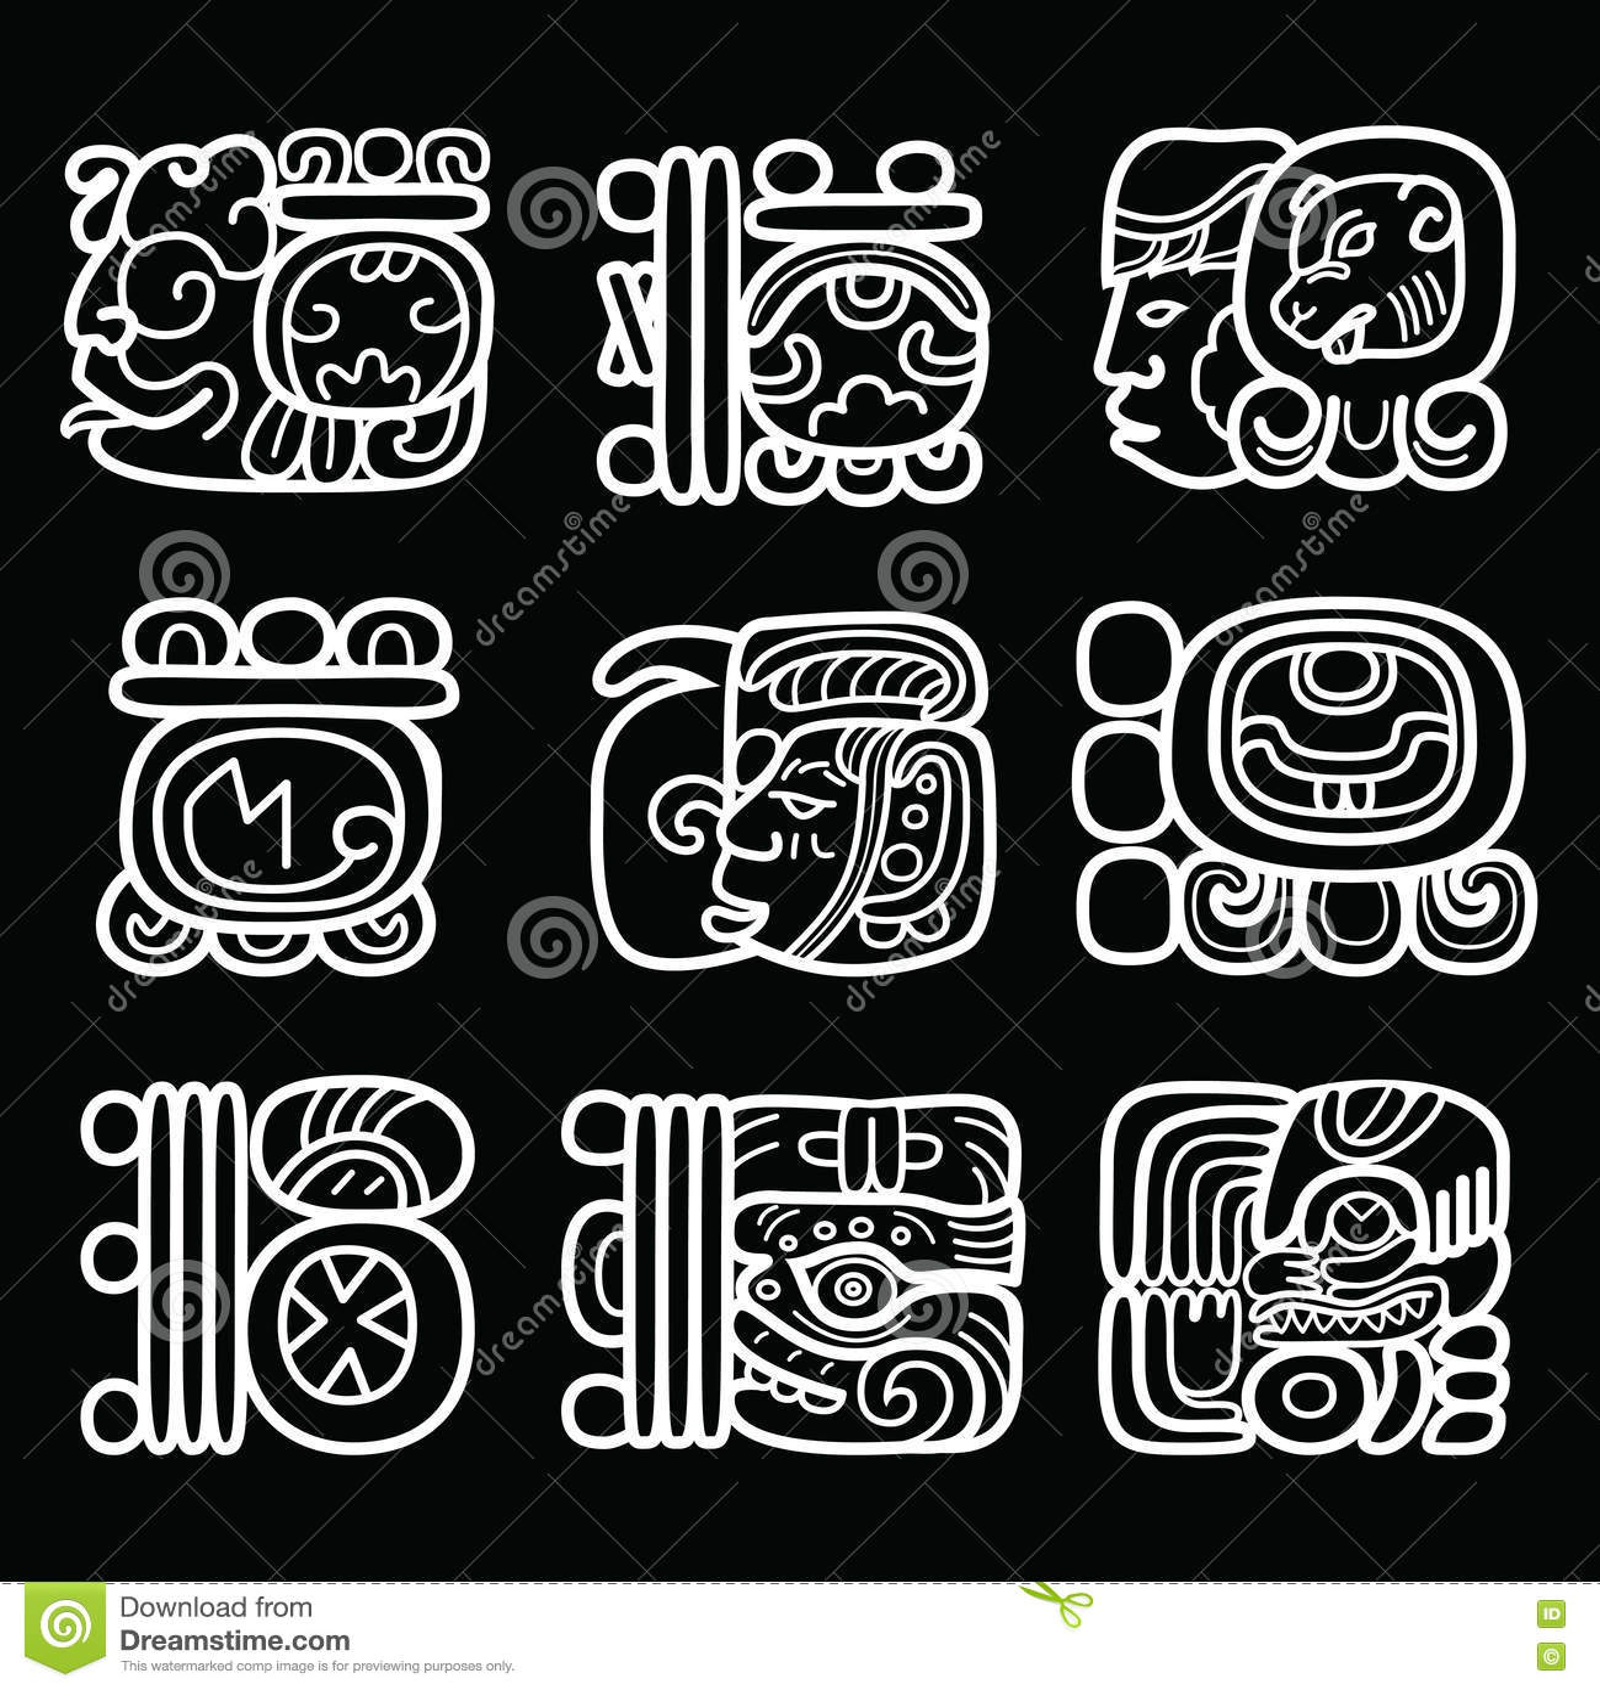 Maya Glyphs, Writing System And Language Vector Design On Black